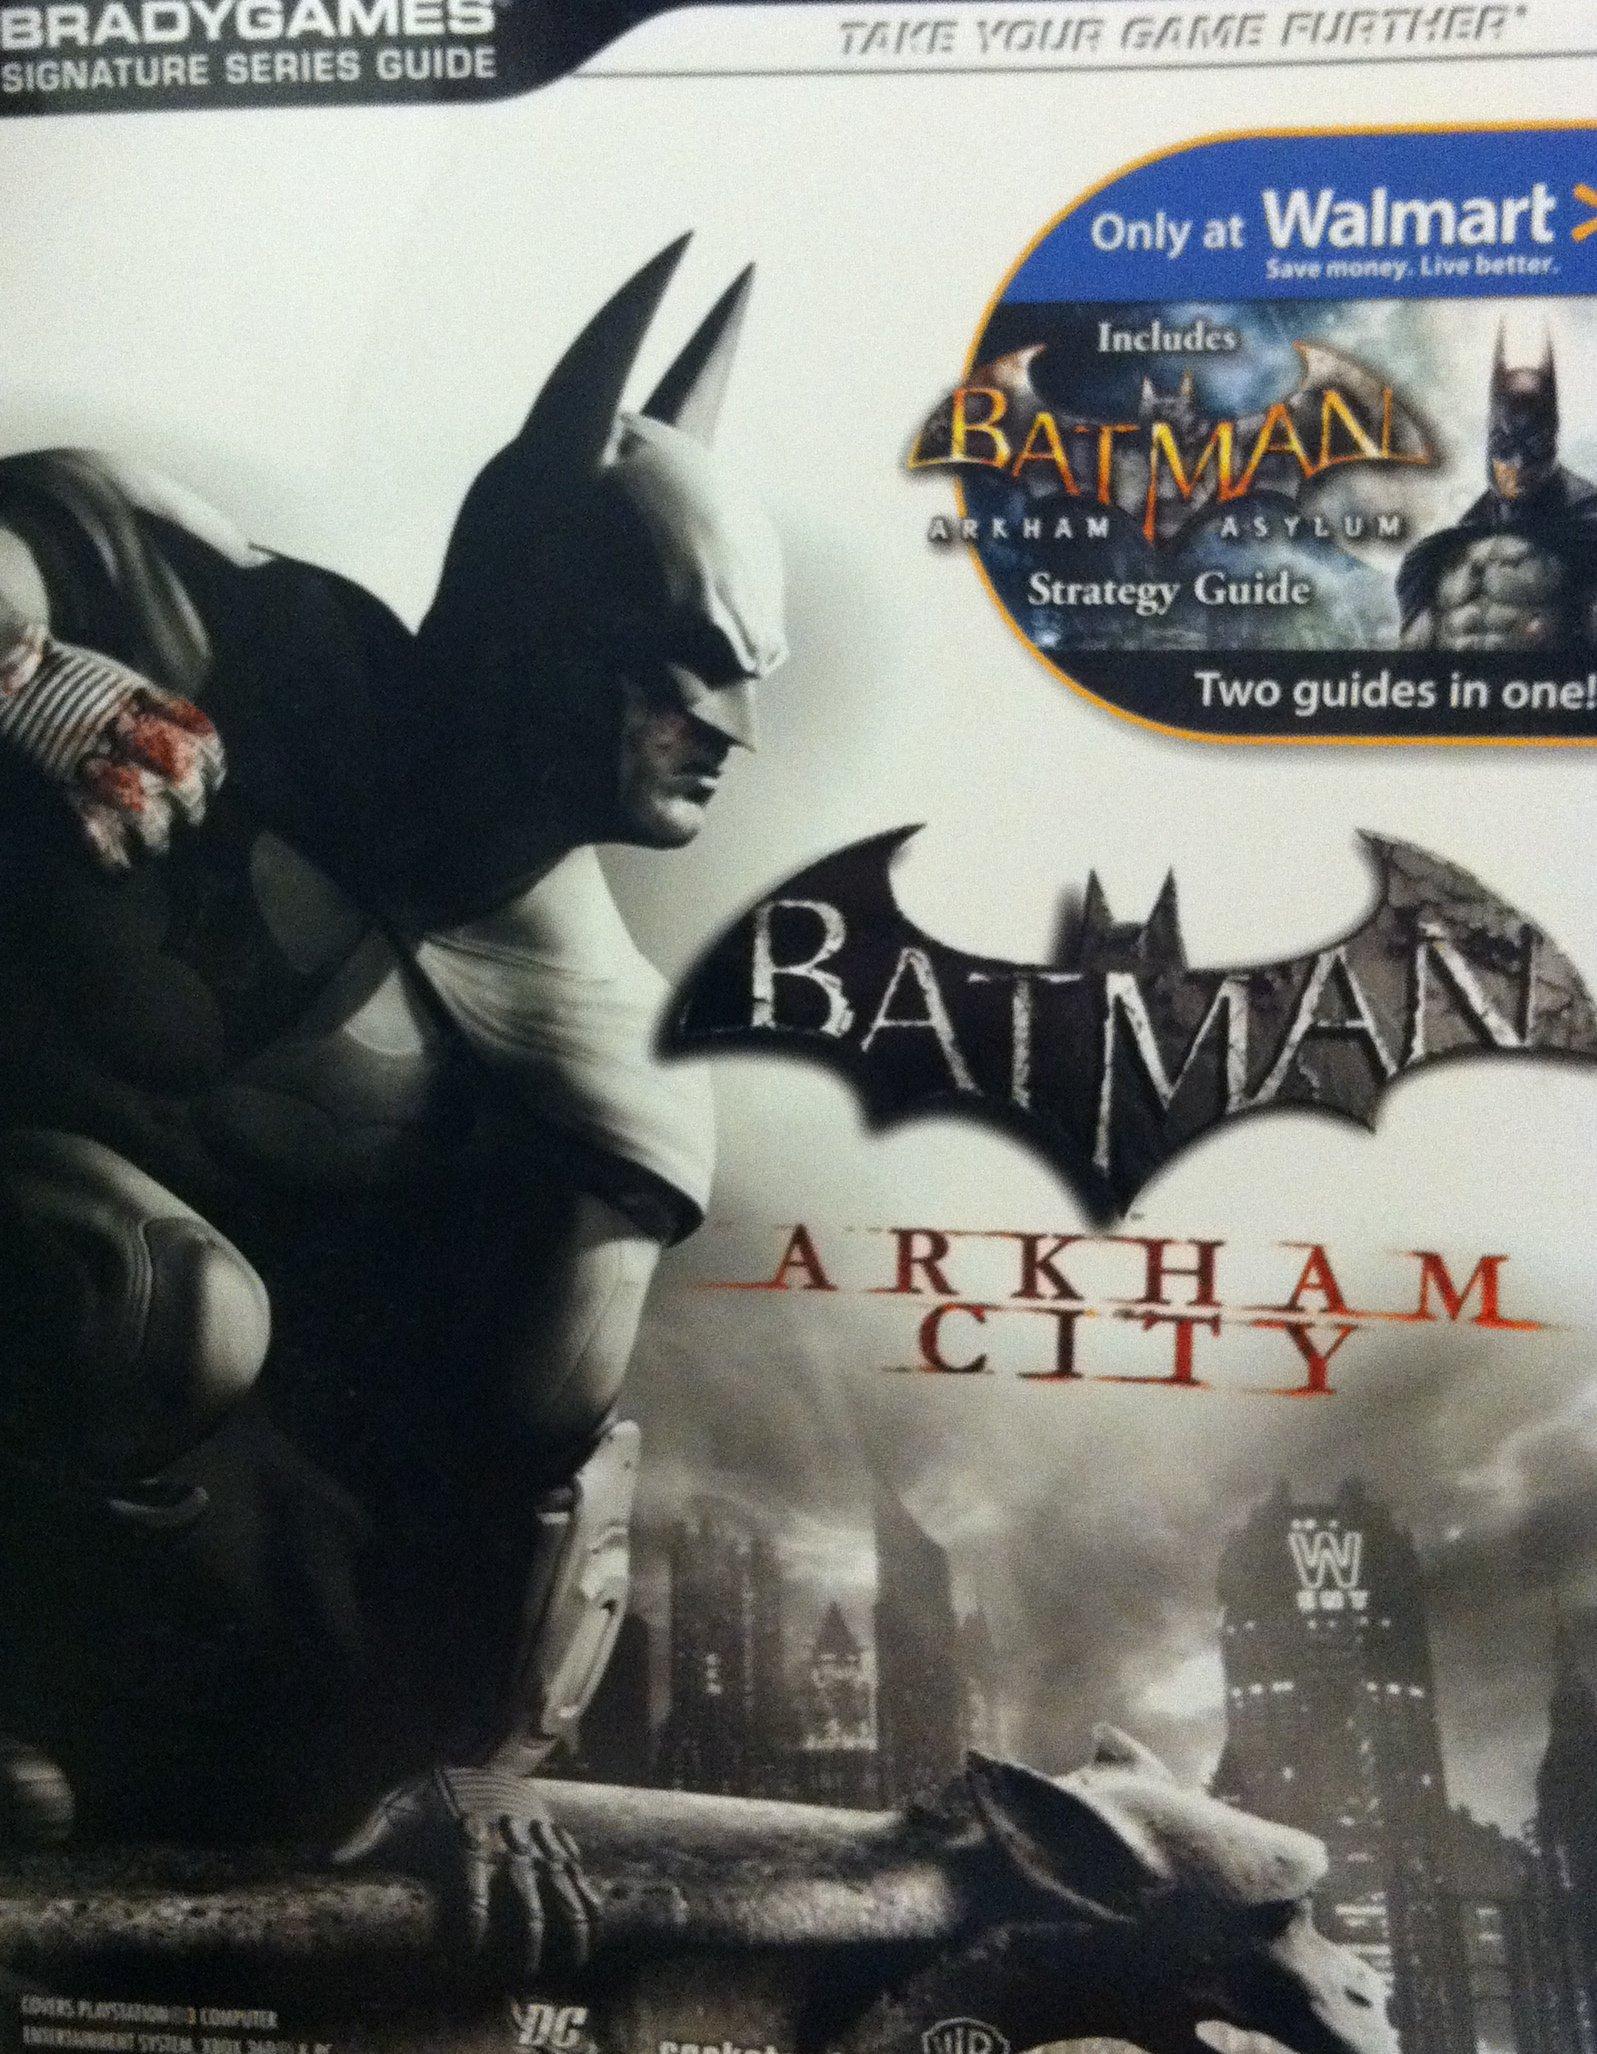 Read Online Batman: Arkham City / Includes Batman Arkham Asylum - Two Guides in One! (BradyGames Signature Series Guide) by Michael Lummis (2011-05-03) ebook